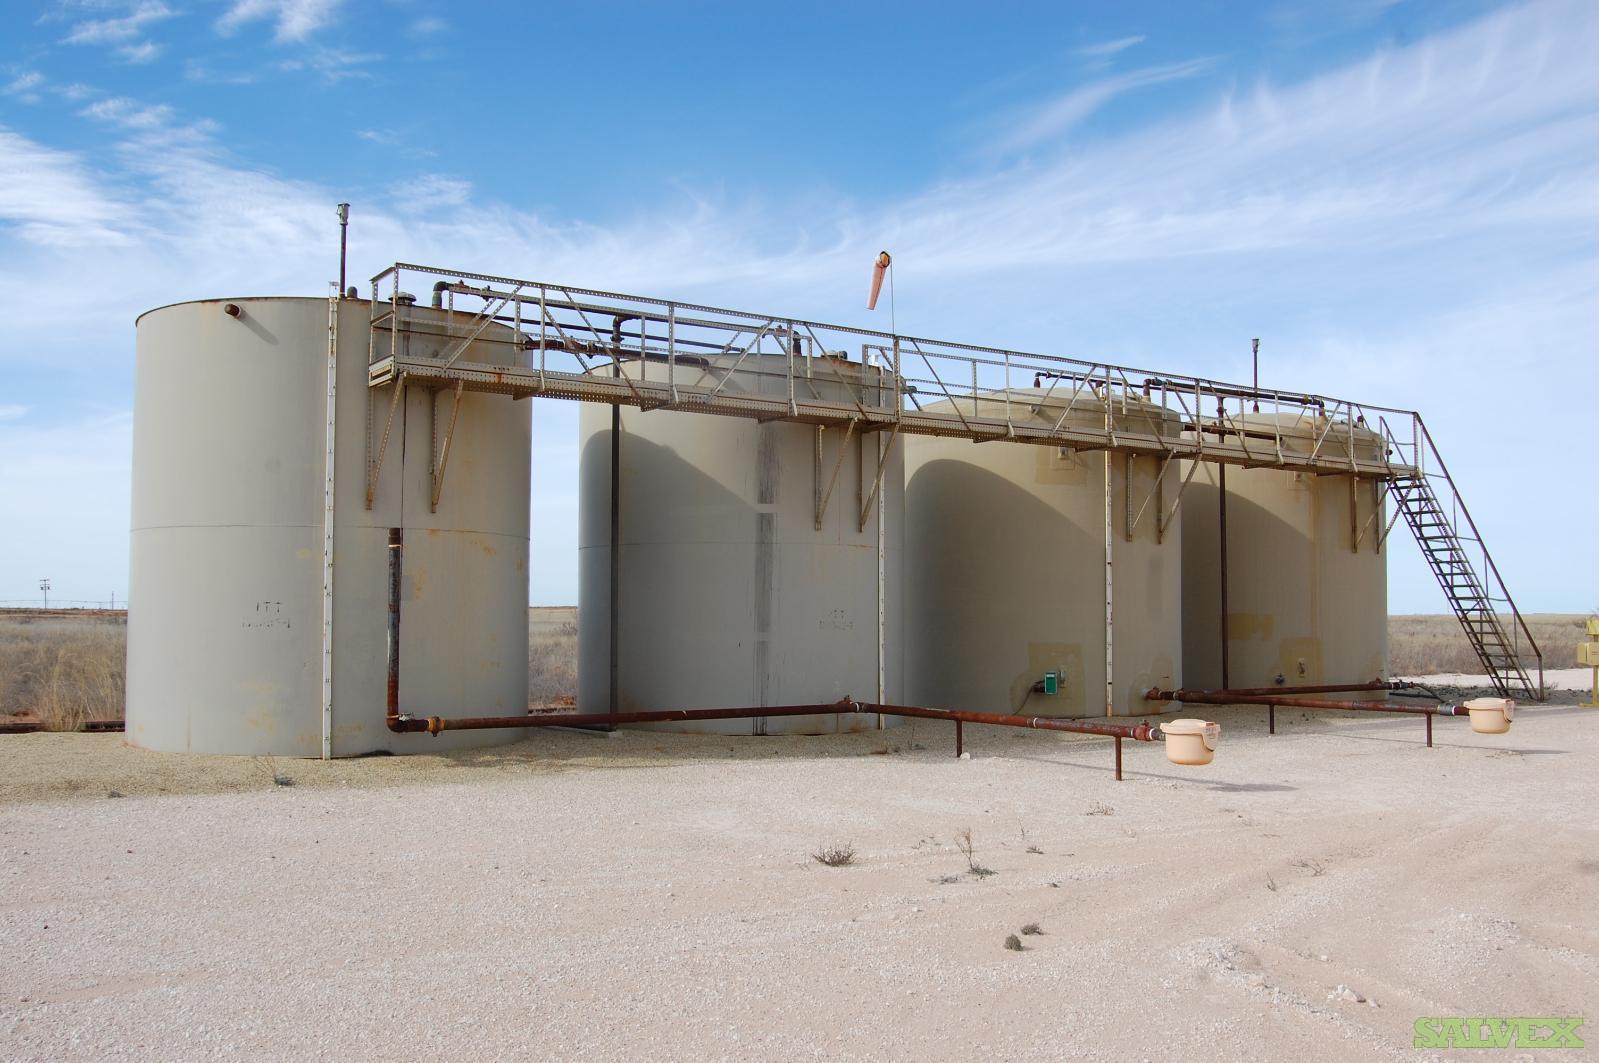 Steel & Fiberglass 500 bbl Tanks, Separator, Heater, Meter Run, Flare and H2S S Station